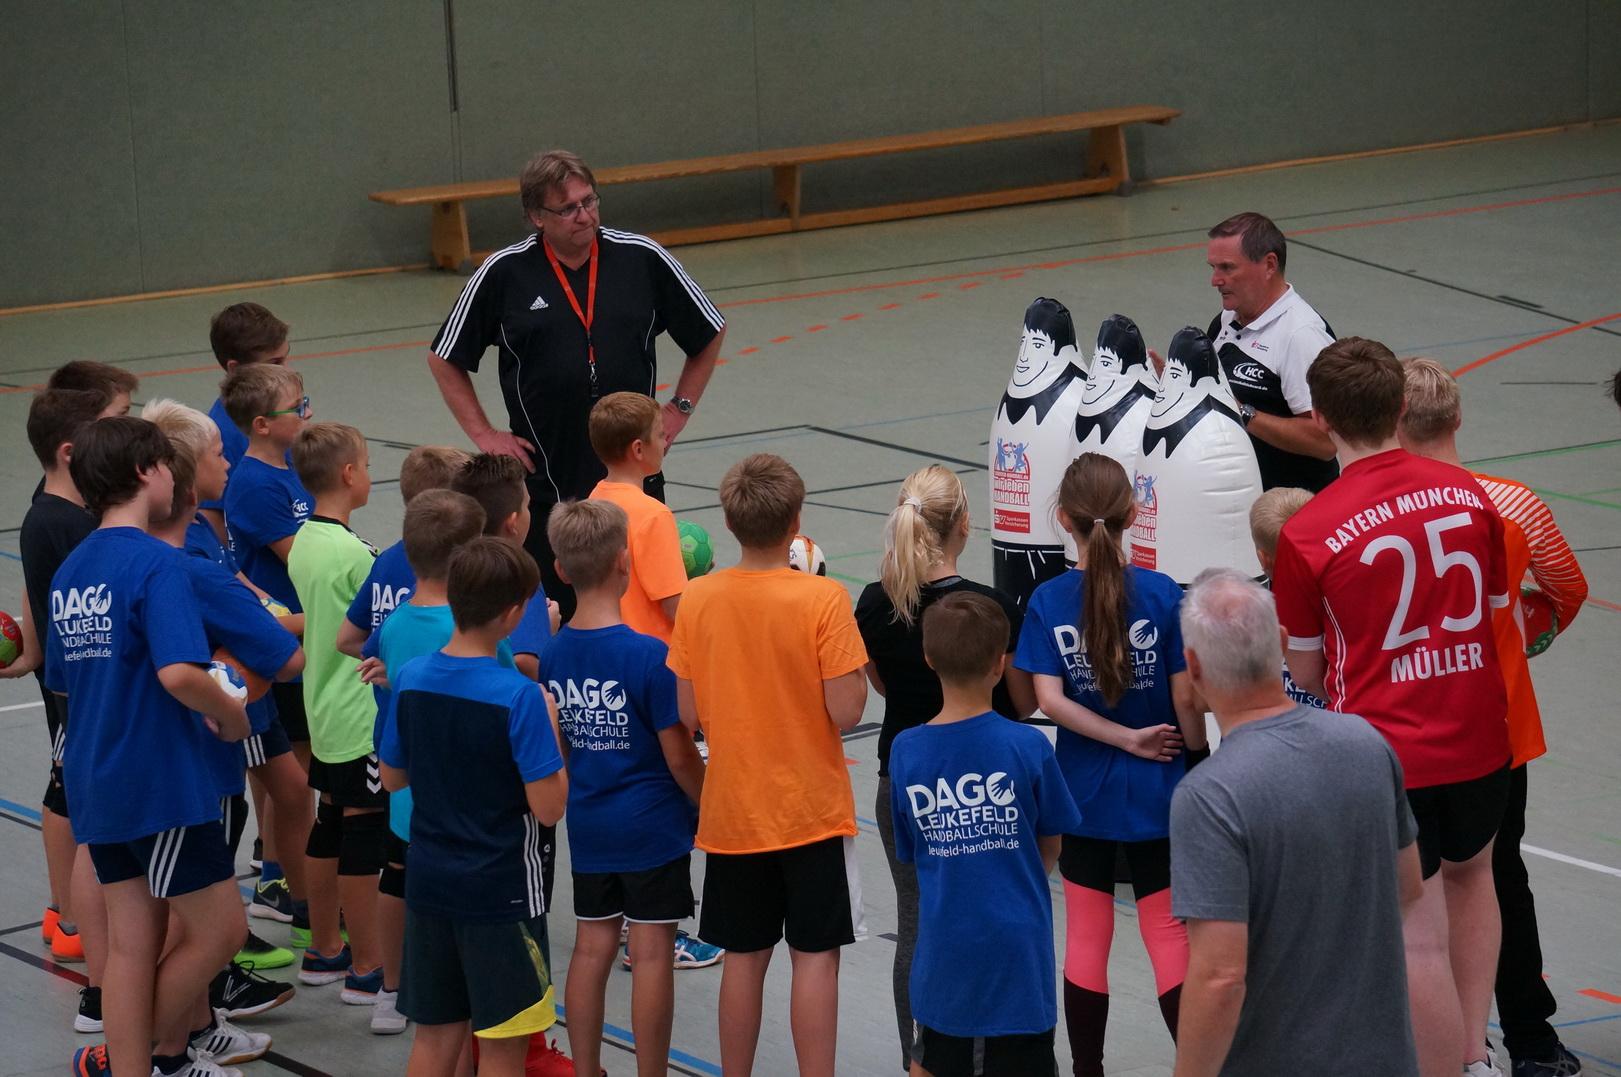 201808_Handballcamp_SDH_MG_249w